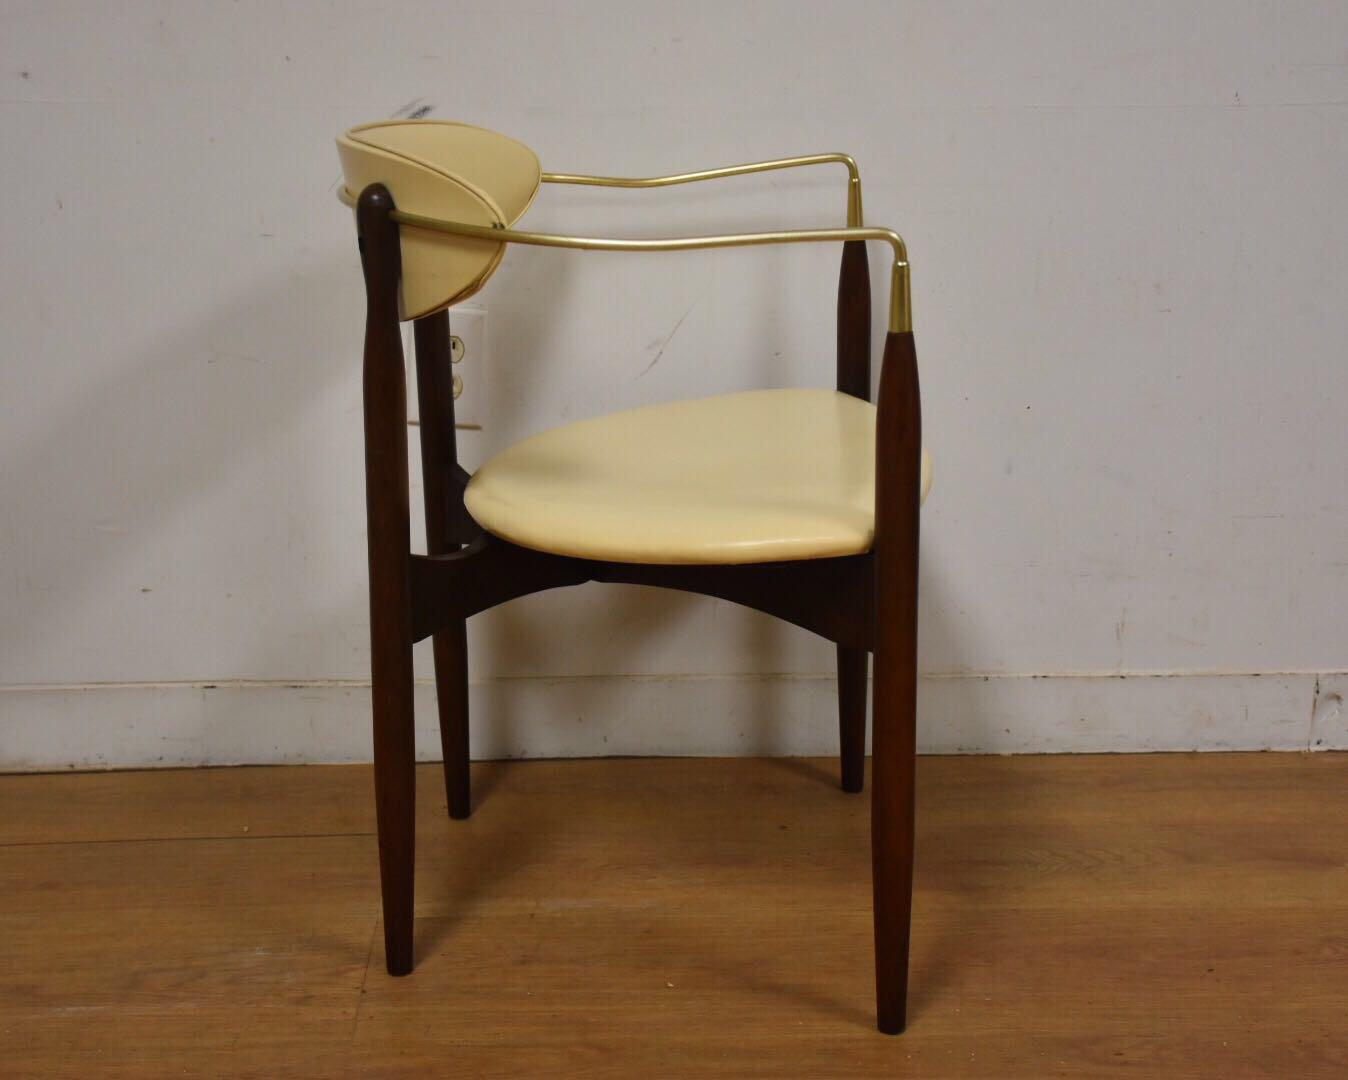 Dan Johnson Beechwood and Off-White Vinyl Viscount Chair - Image 4 of 10